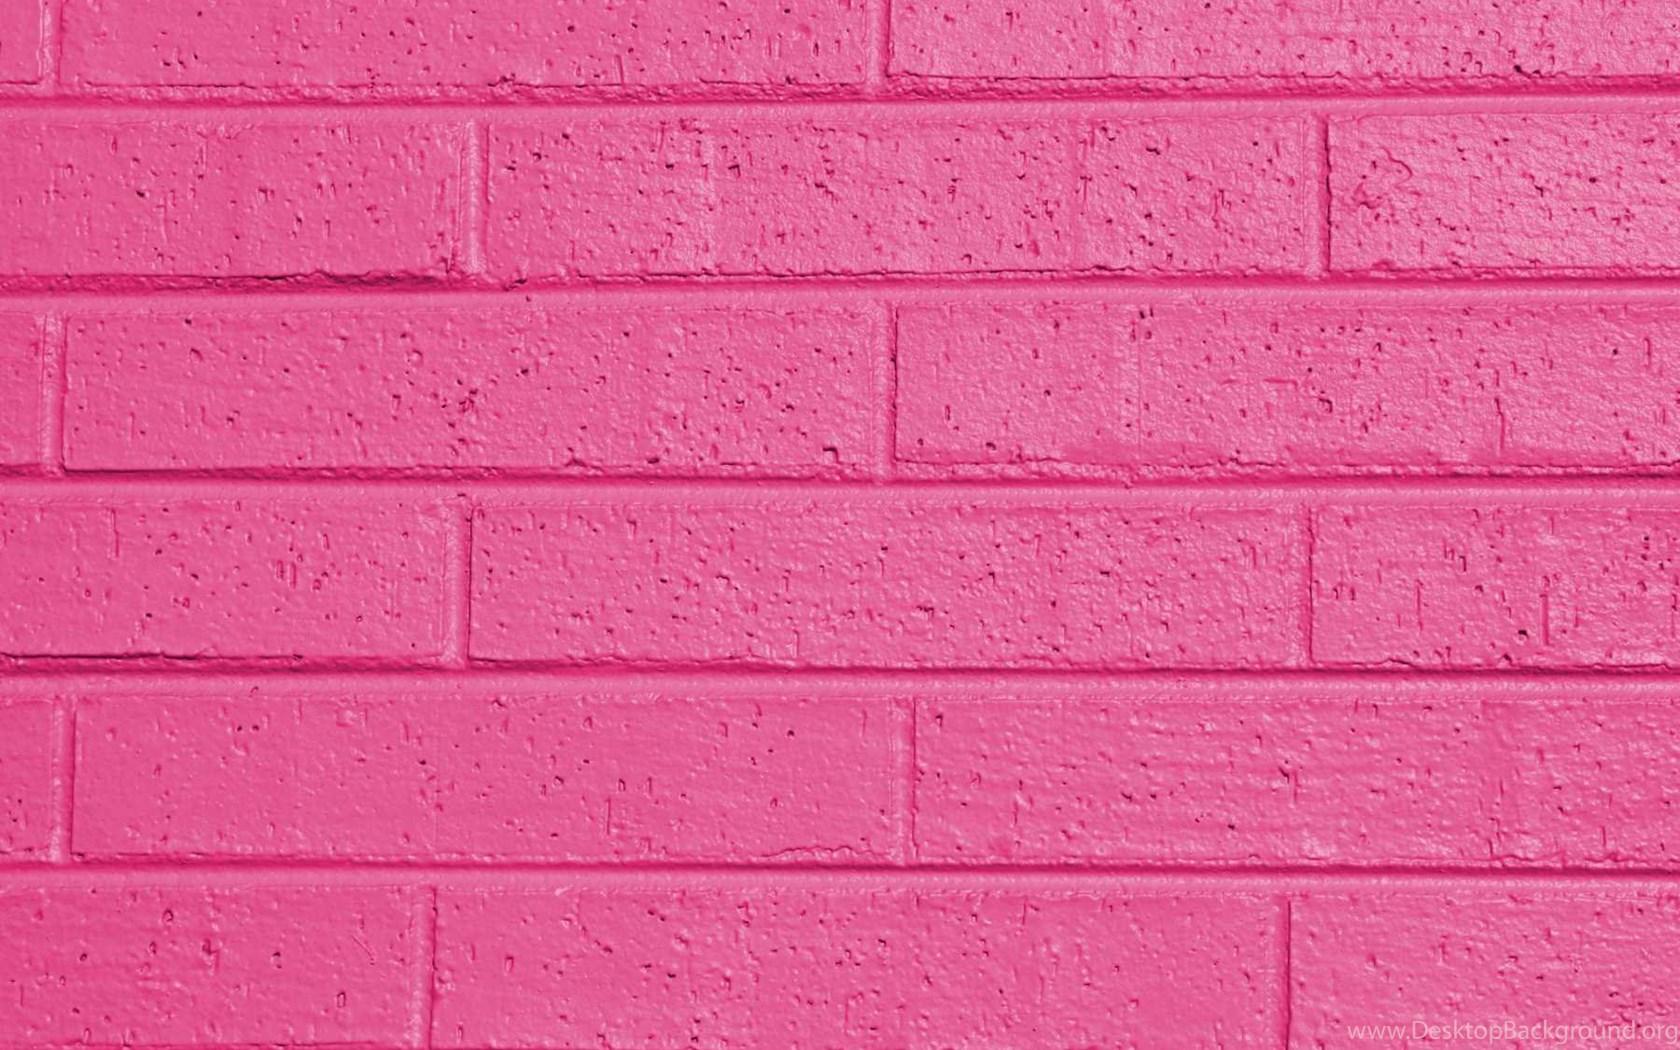 609208 pink wallpaper tumblr hd